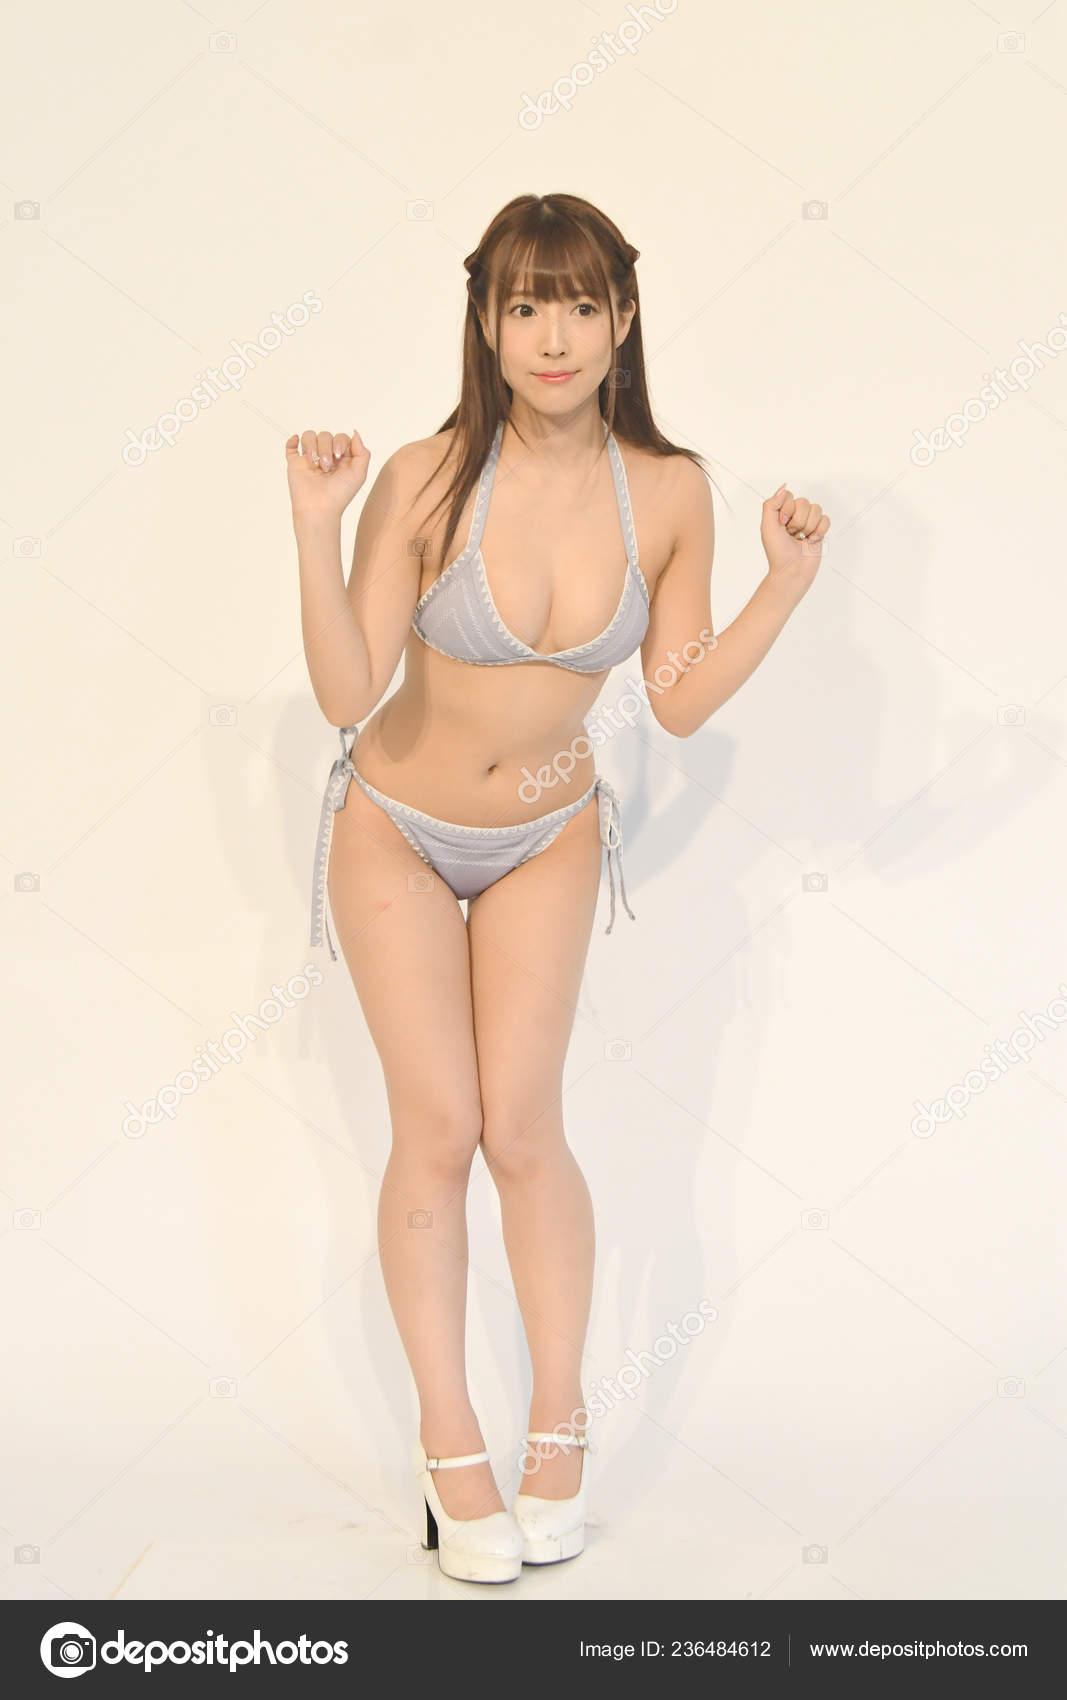 Entertaining japanese bikini idol pics theme, interesting